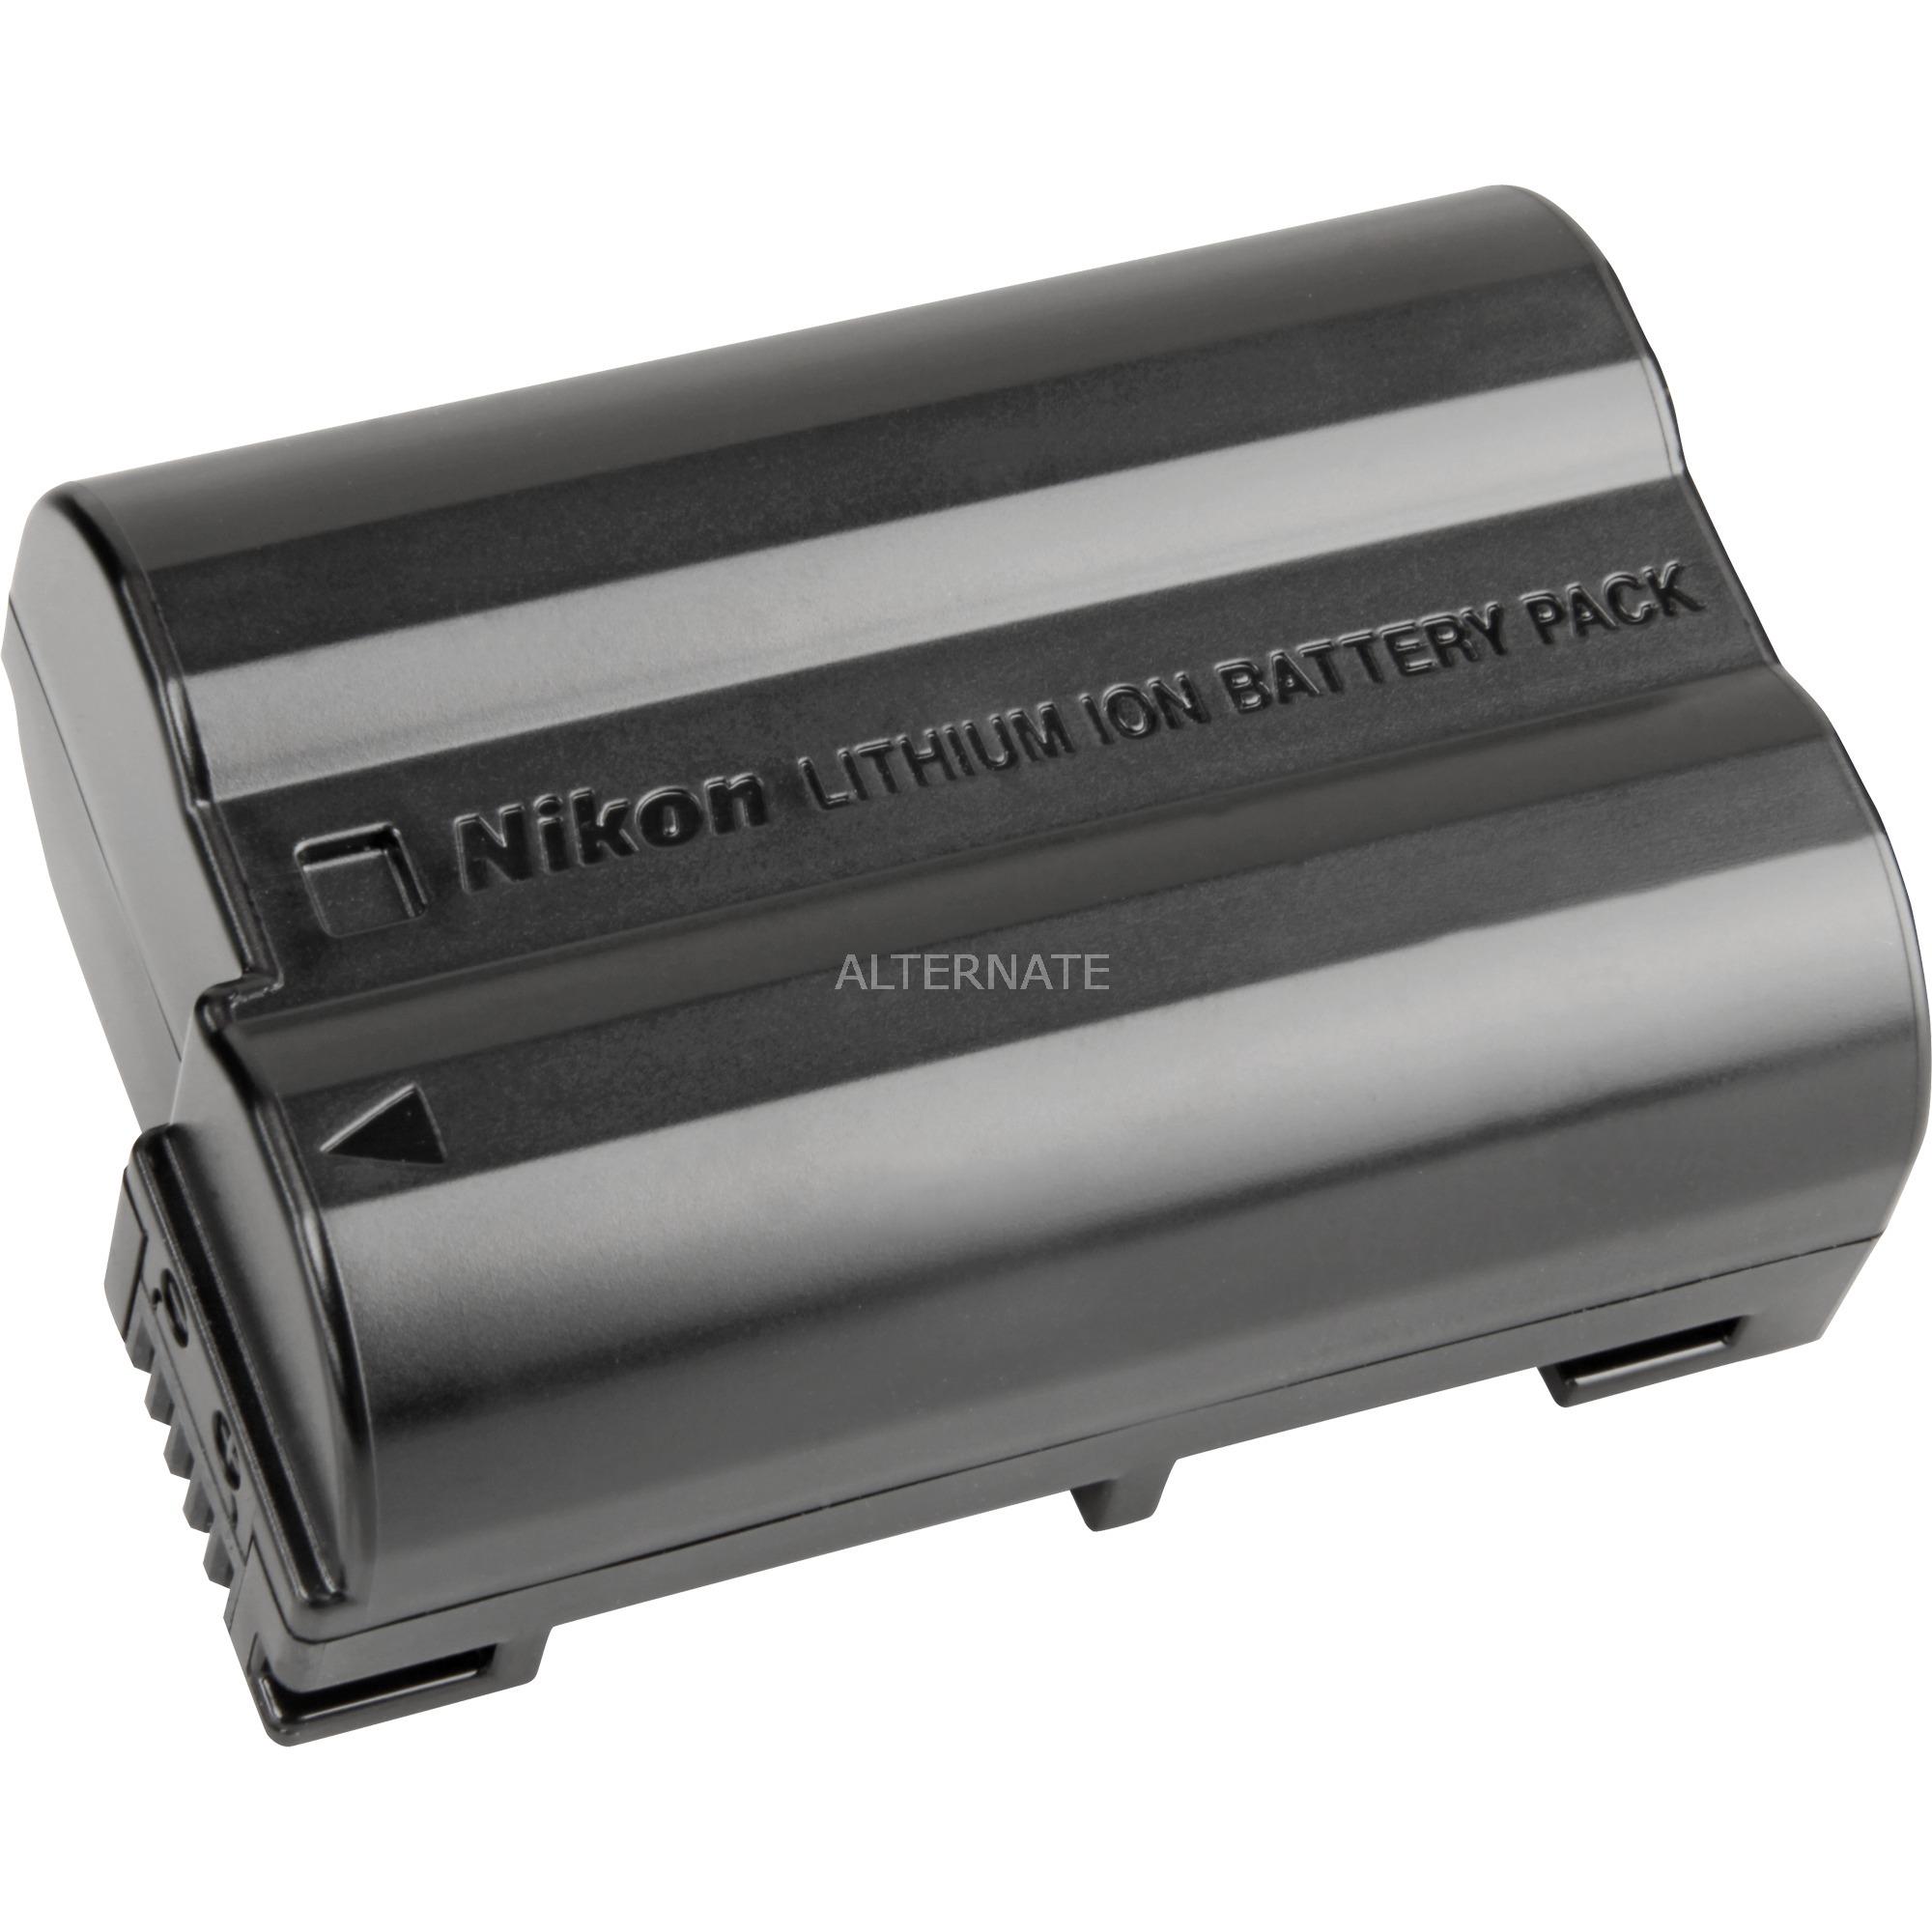 Rechargeable Li-ion battery EN-EL15 Ión de litio 1900mAh 7V batería recargable, Batería para cámara